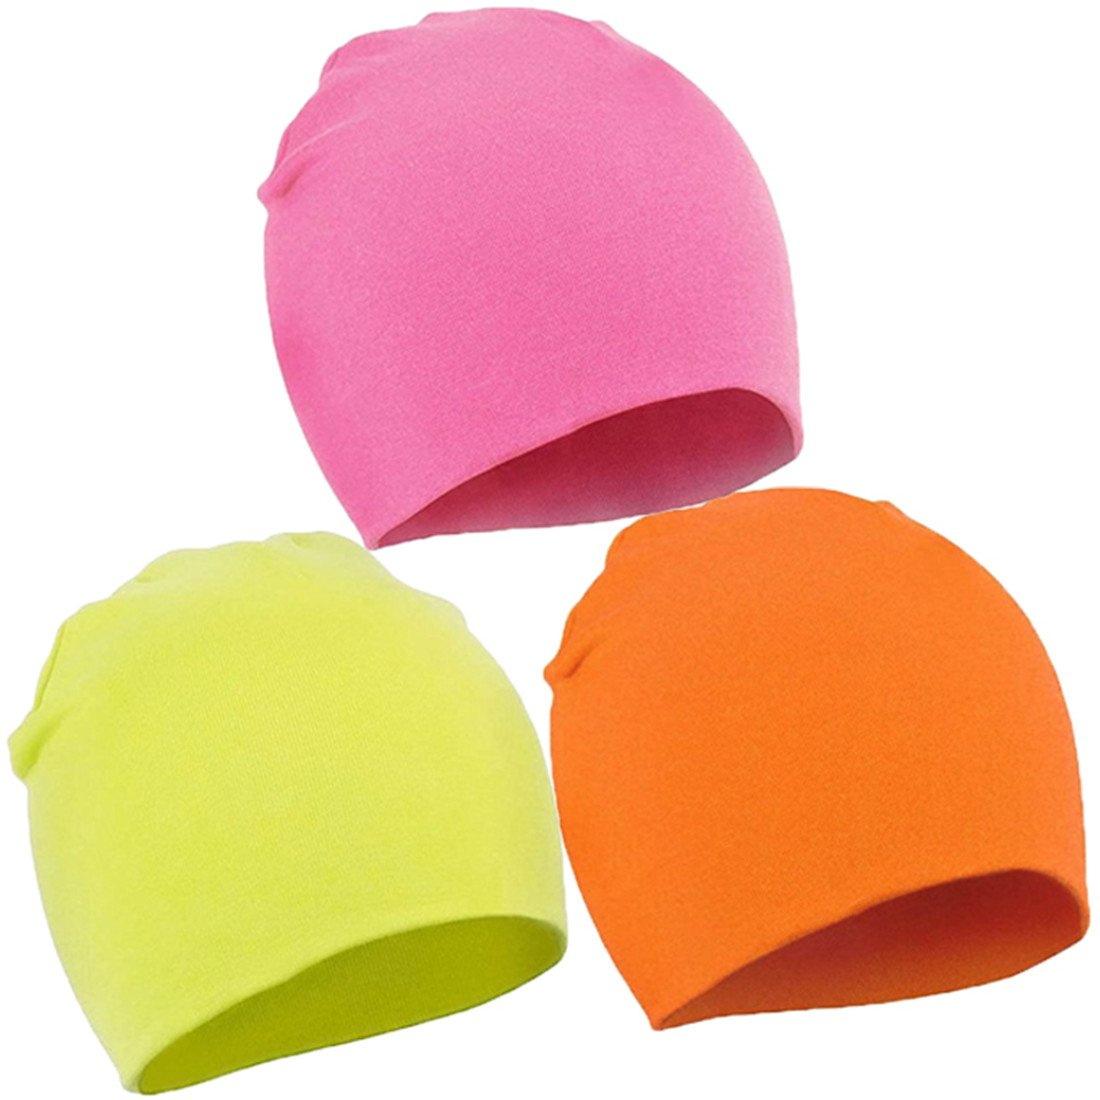 FAIRYRAIN 3 Pcs of Baby Boy Kids Girl Cotton Soft Cute Knit Kids Hat Beanies Cap 1-4 Years JKL2